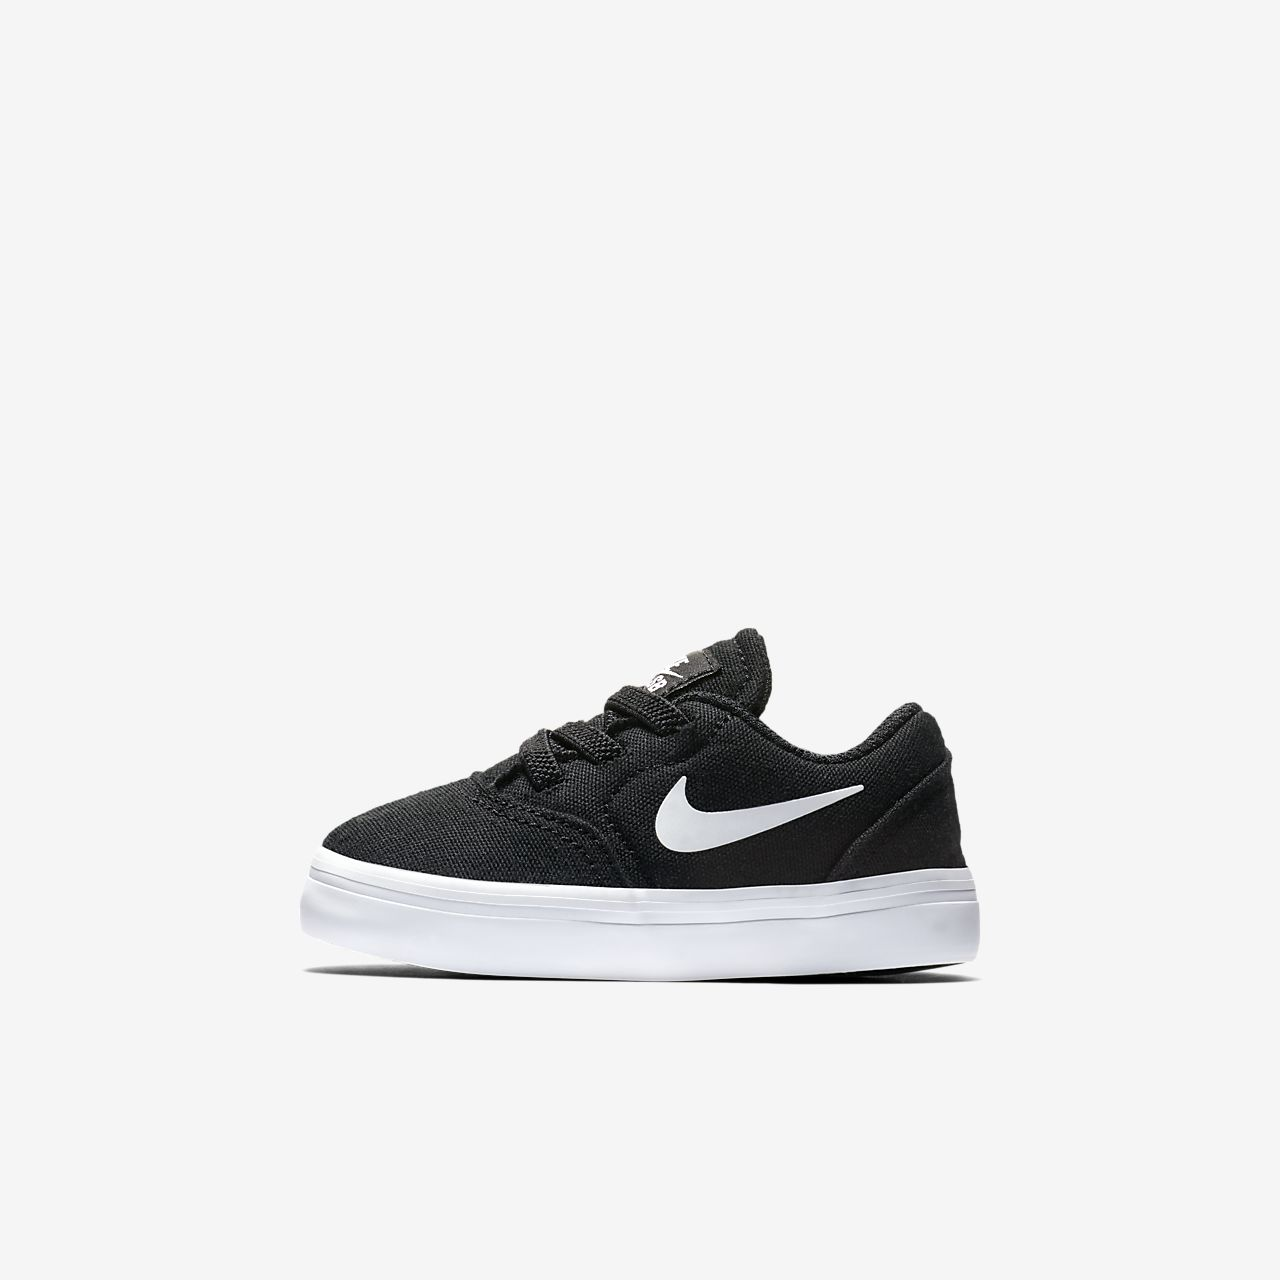 Buty dla niemowląt Nike SB Check Canvas